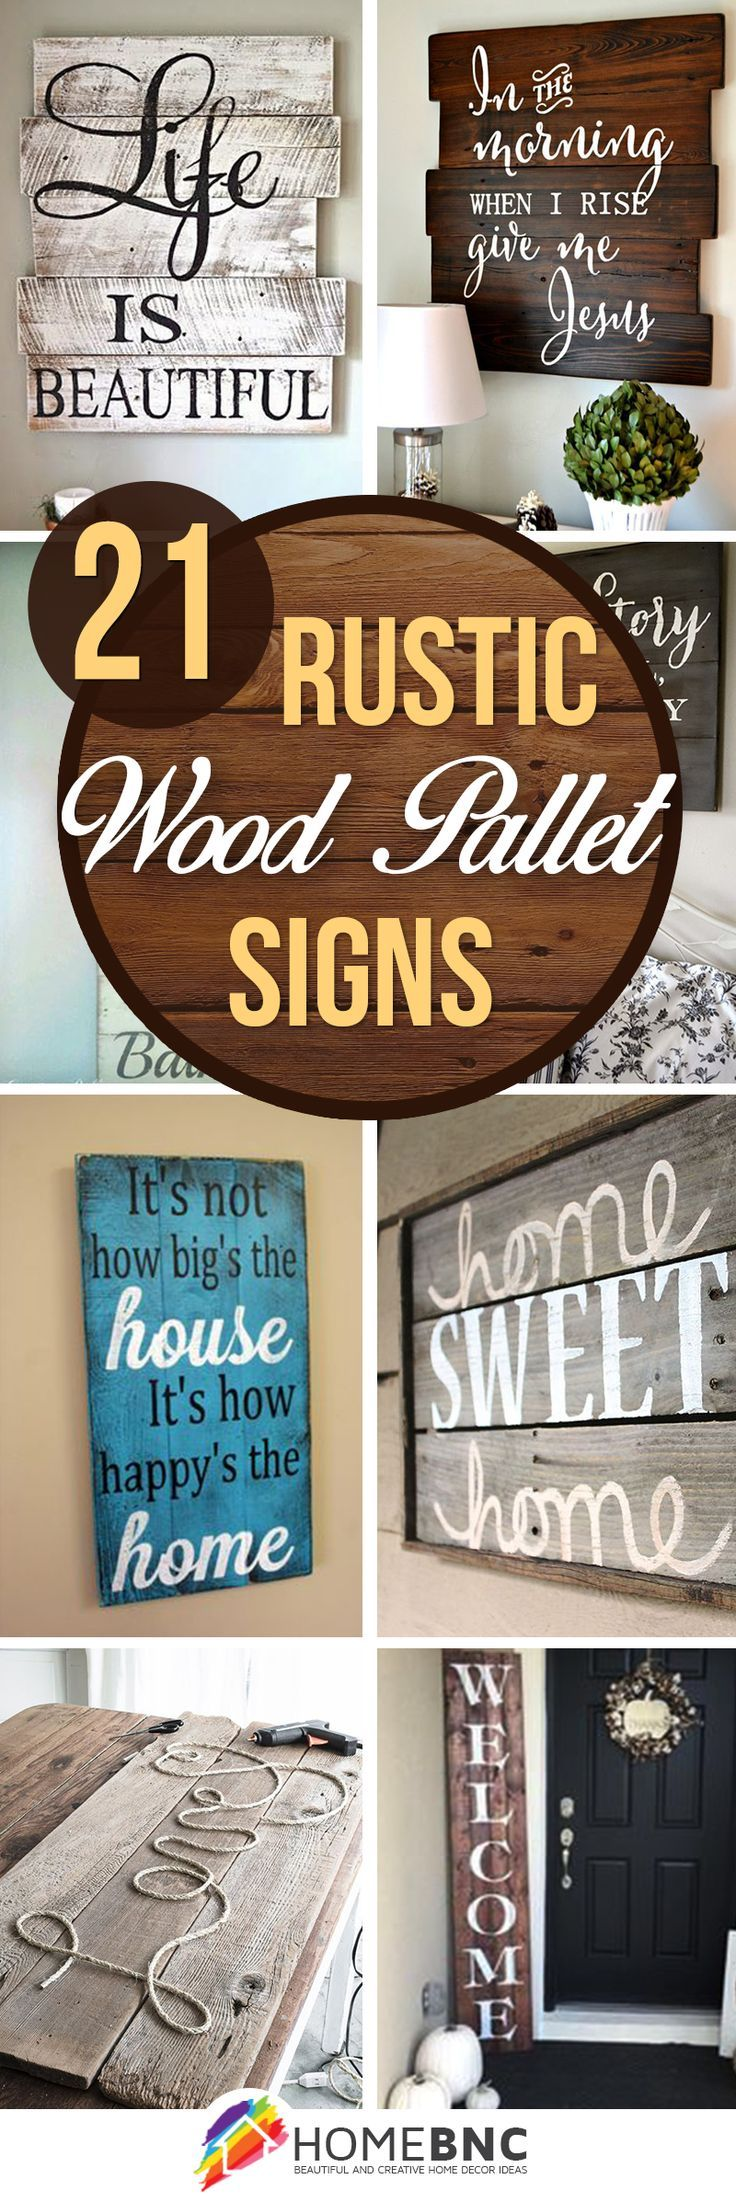 M s de 25 ideas incre bles sobre letreros de madera en for Letras decoracion ikea